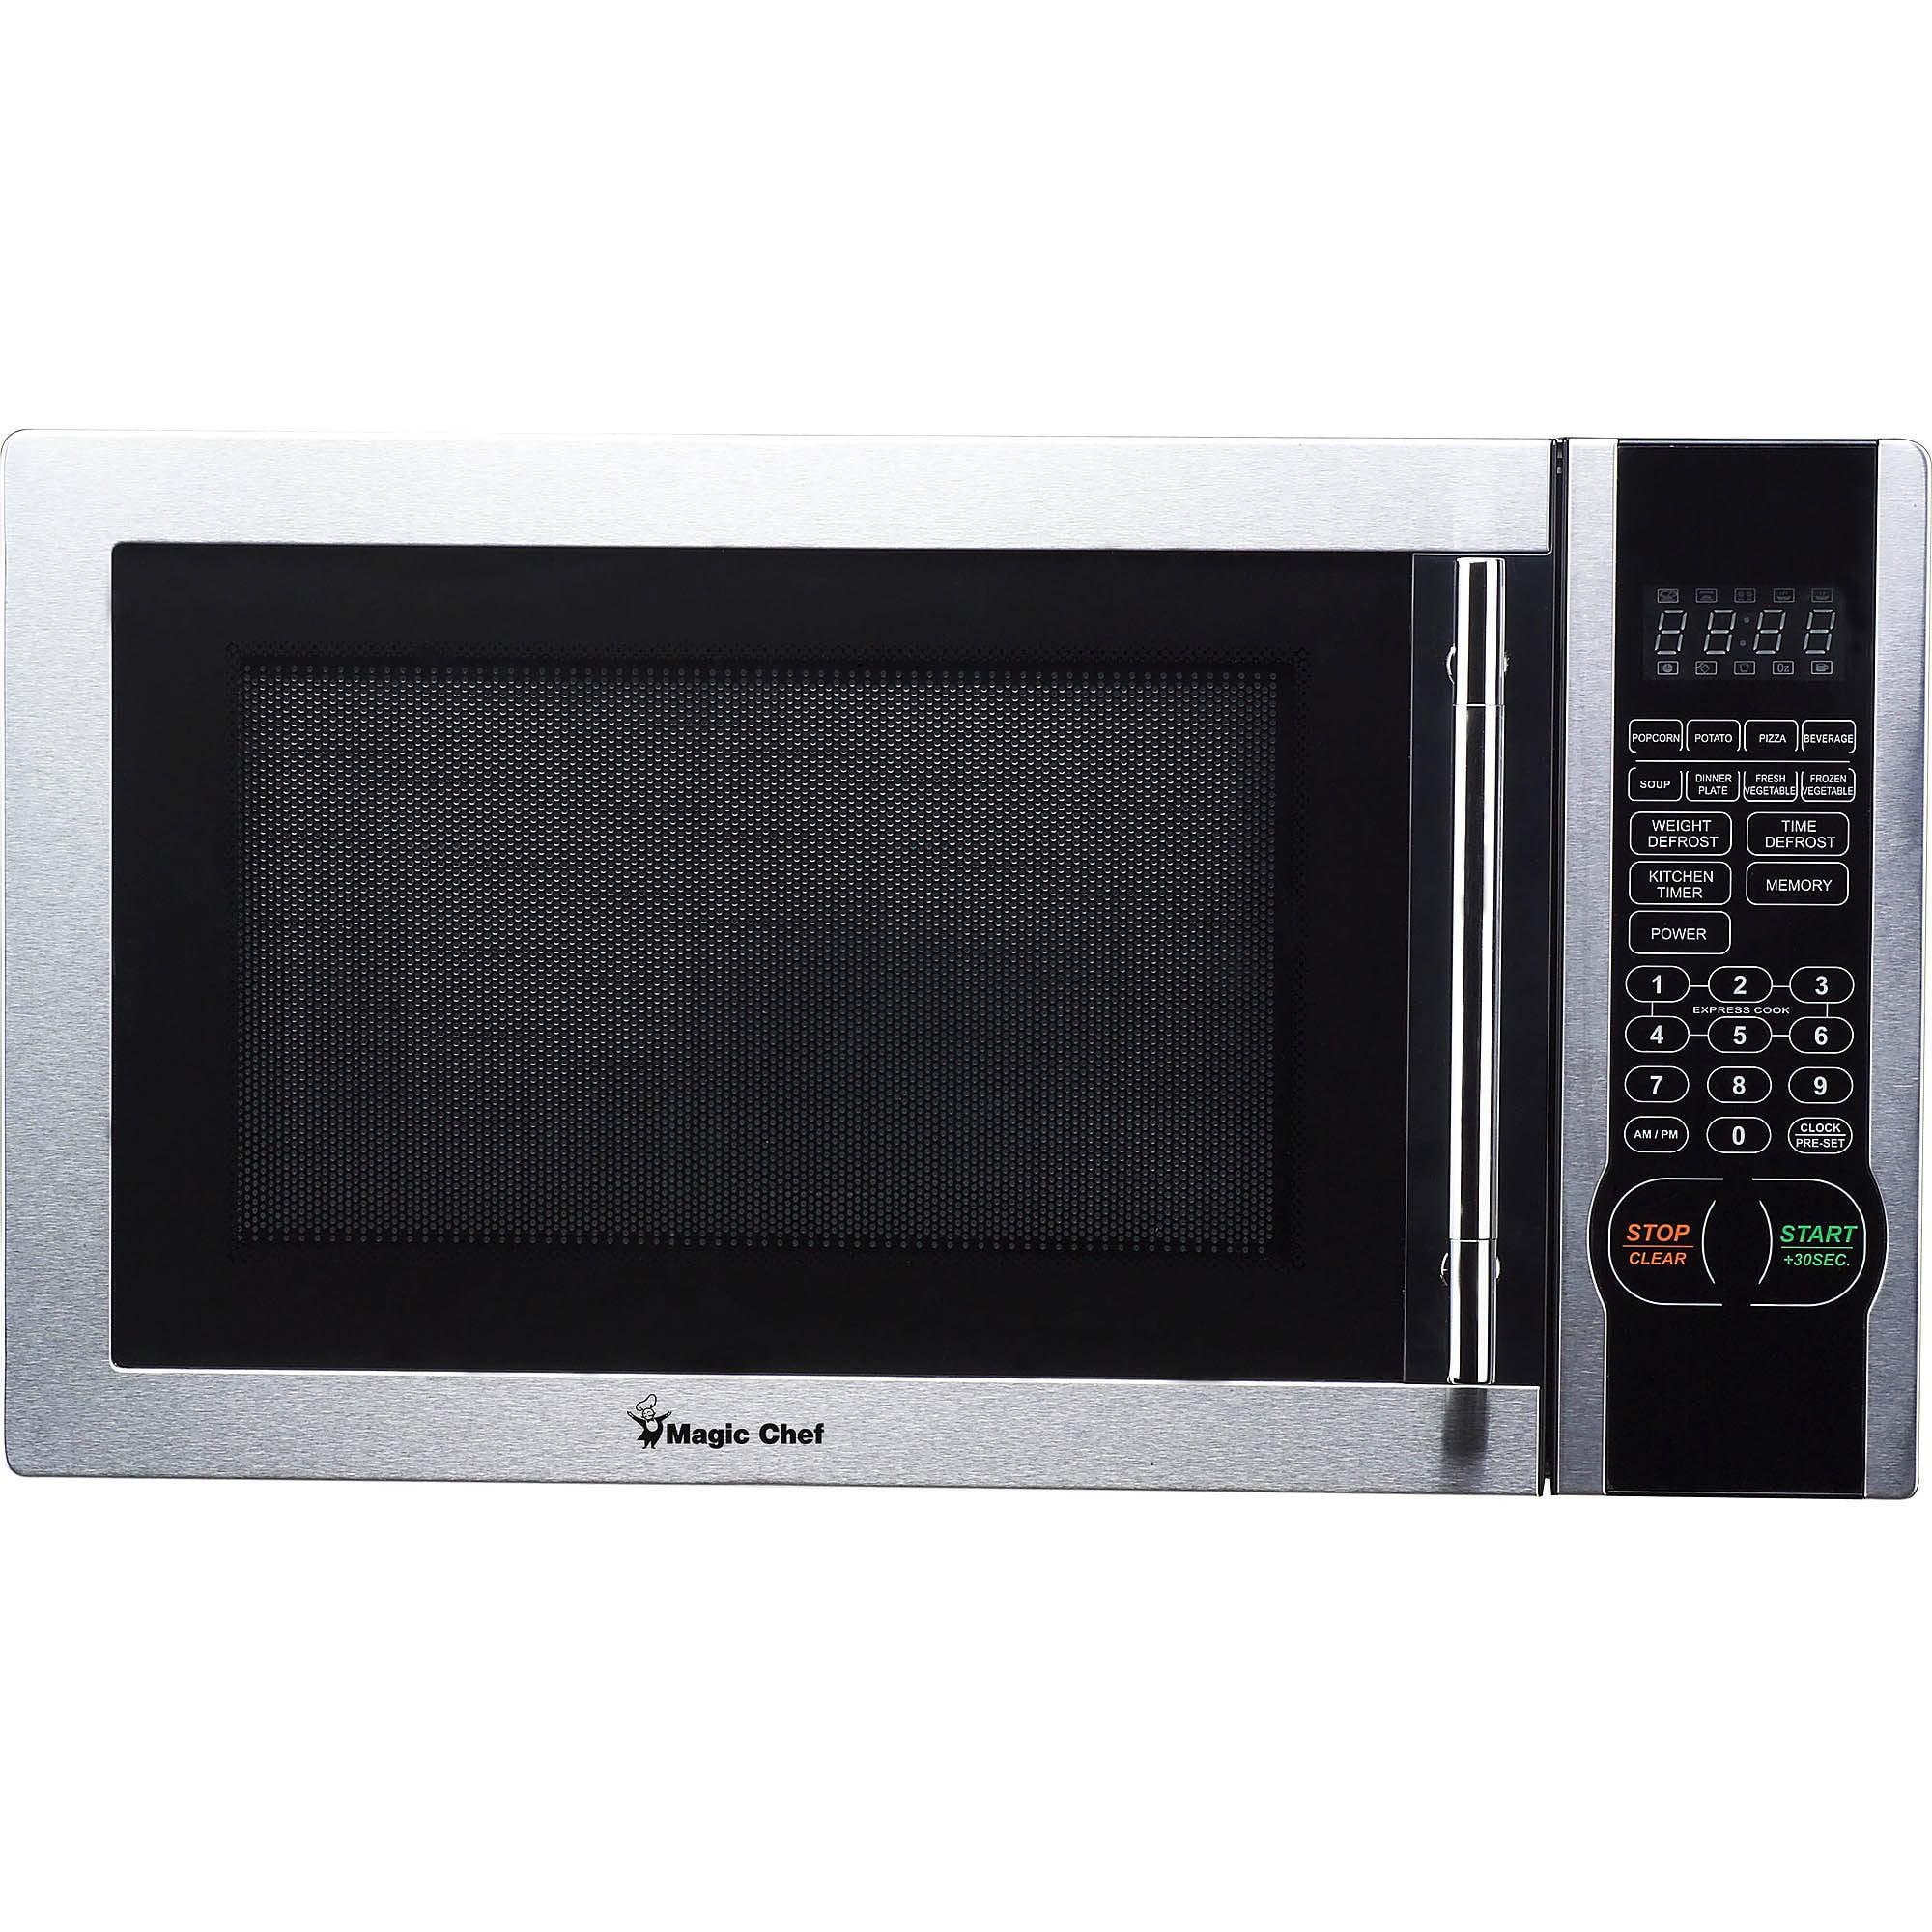 Magic Chef 1.1 cu. ft. Digital Microwave